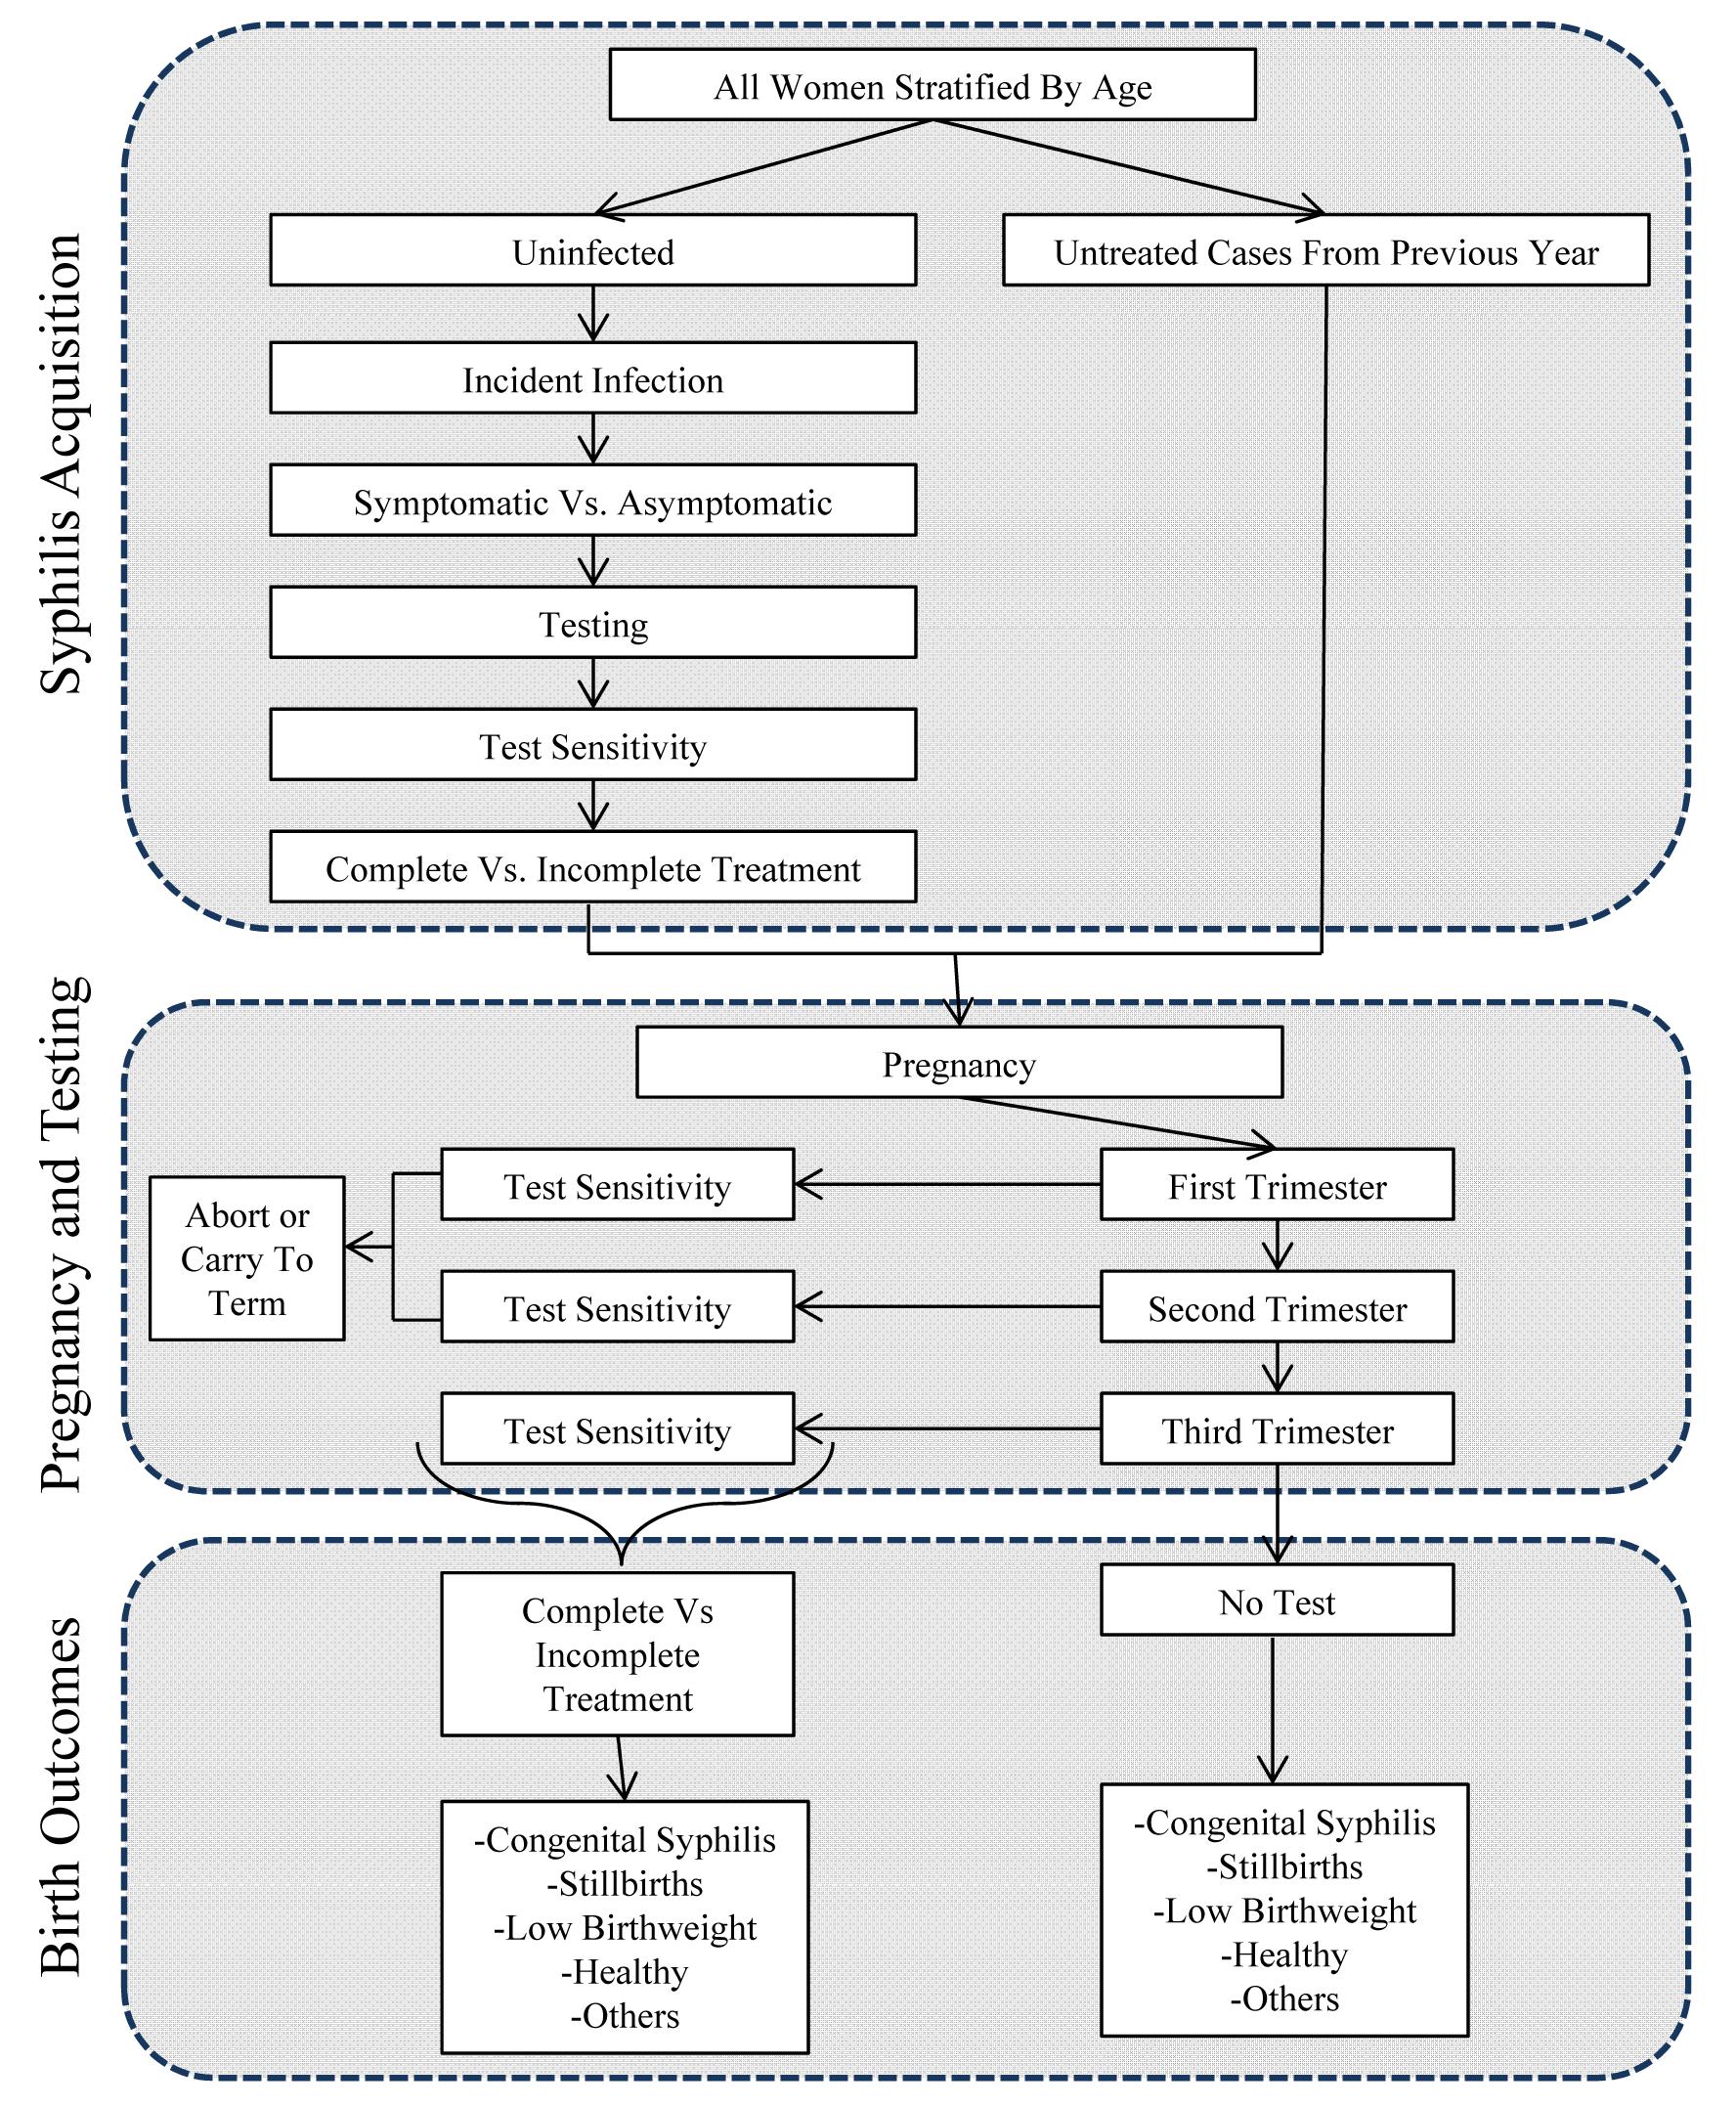 Decision analytic model.